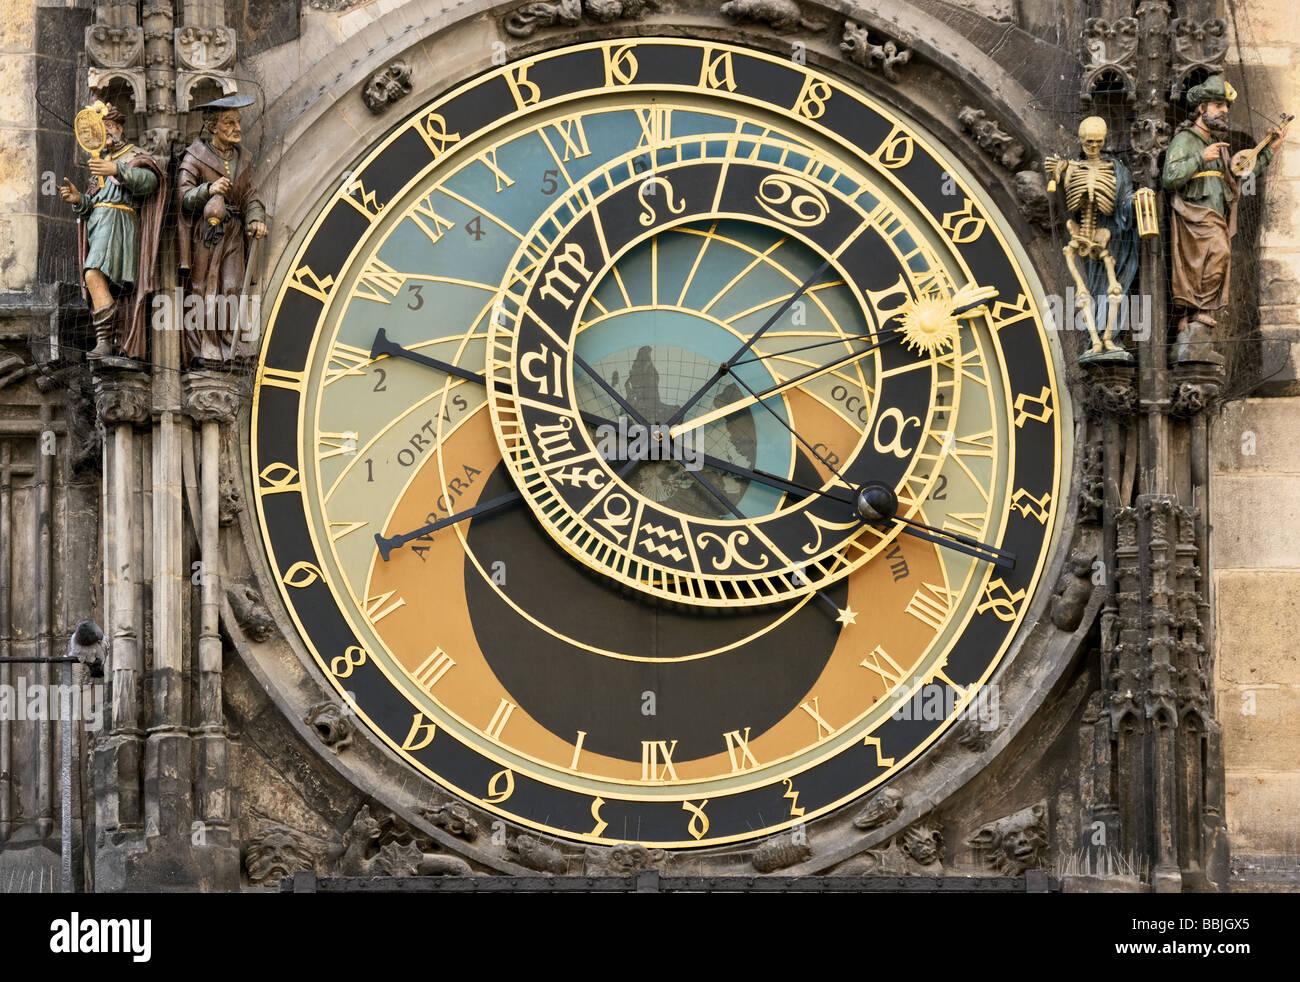 Prague Orloj astronomical clock on town hall tower - Stock Image